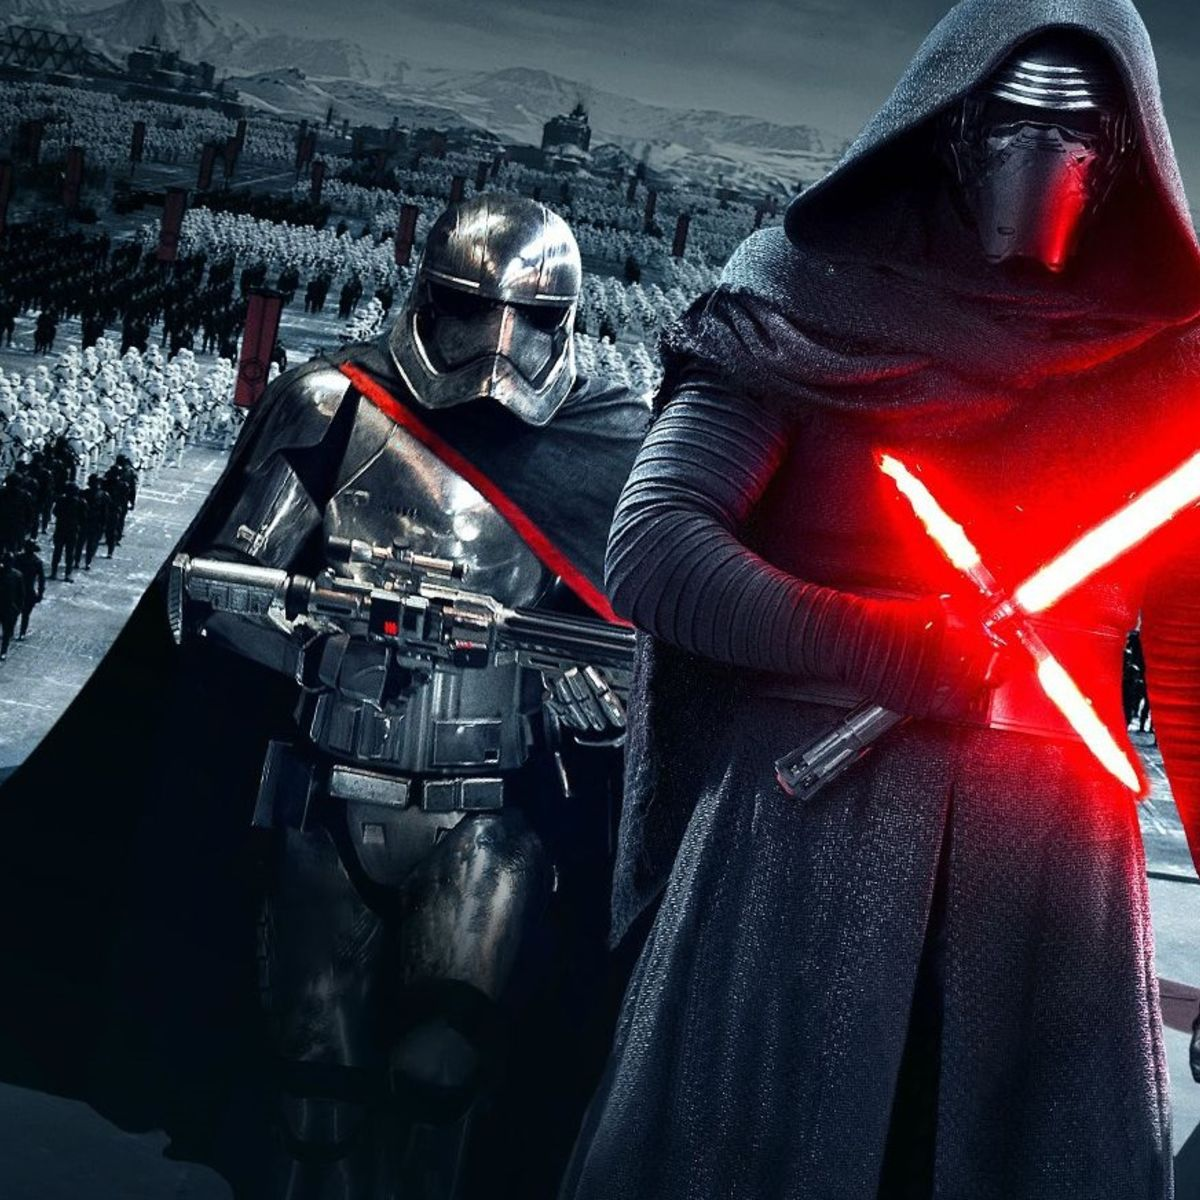 star-wars-7-poster-international_1.jpg